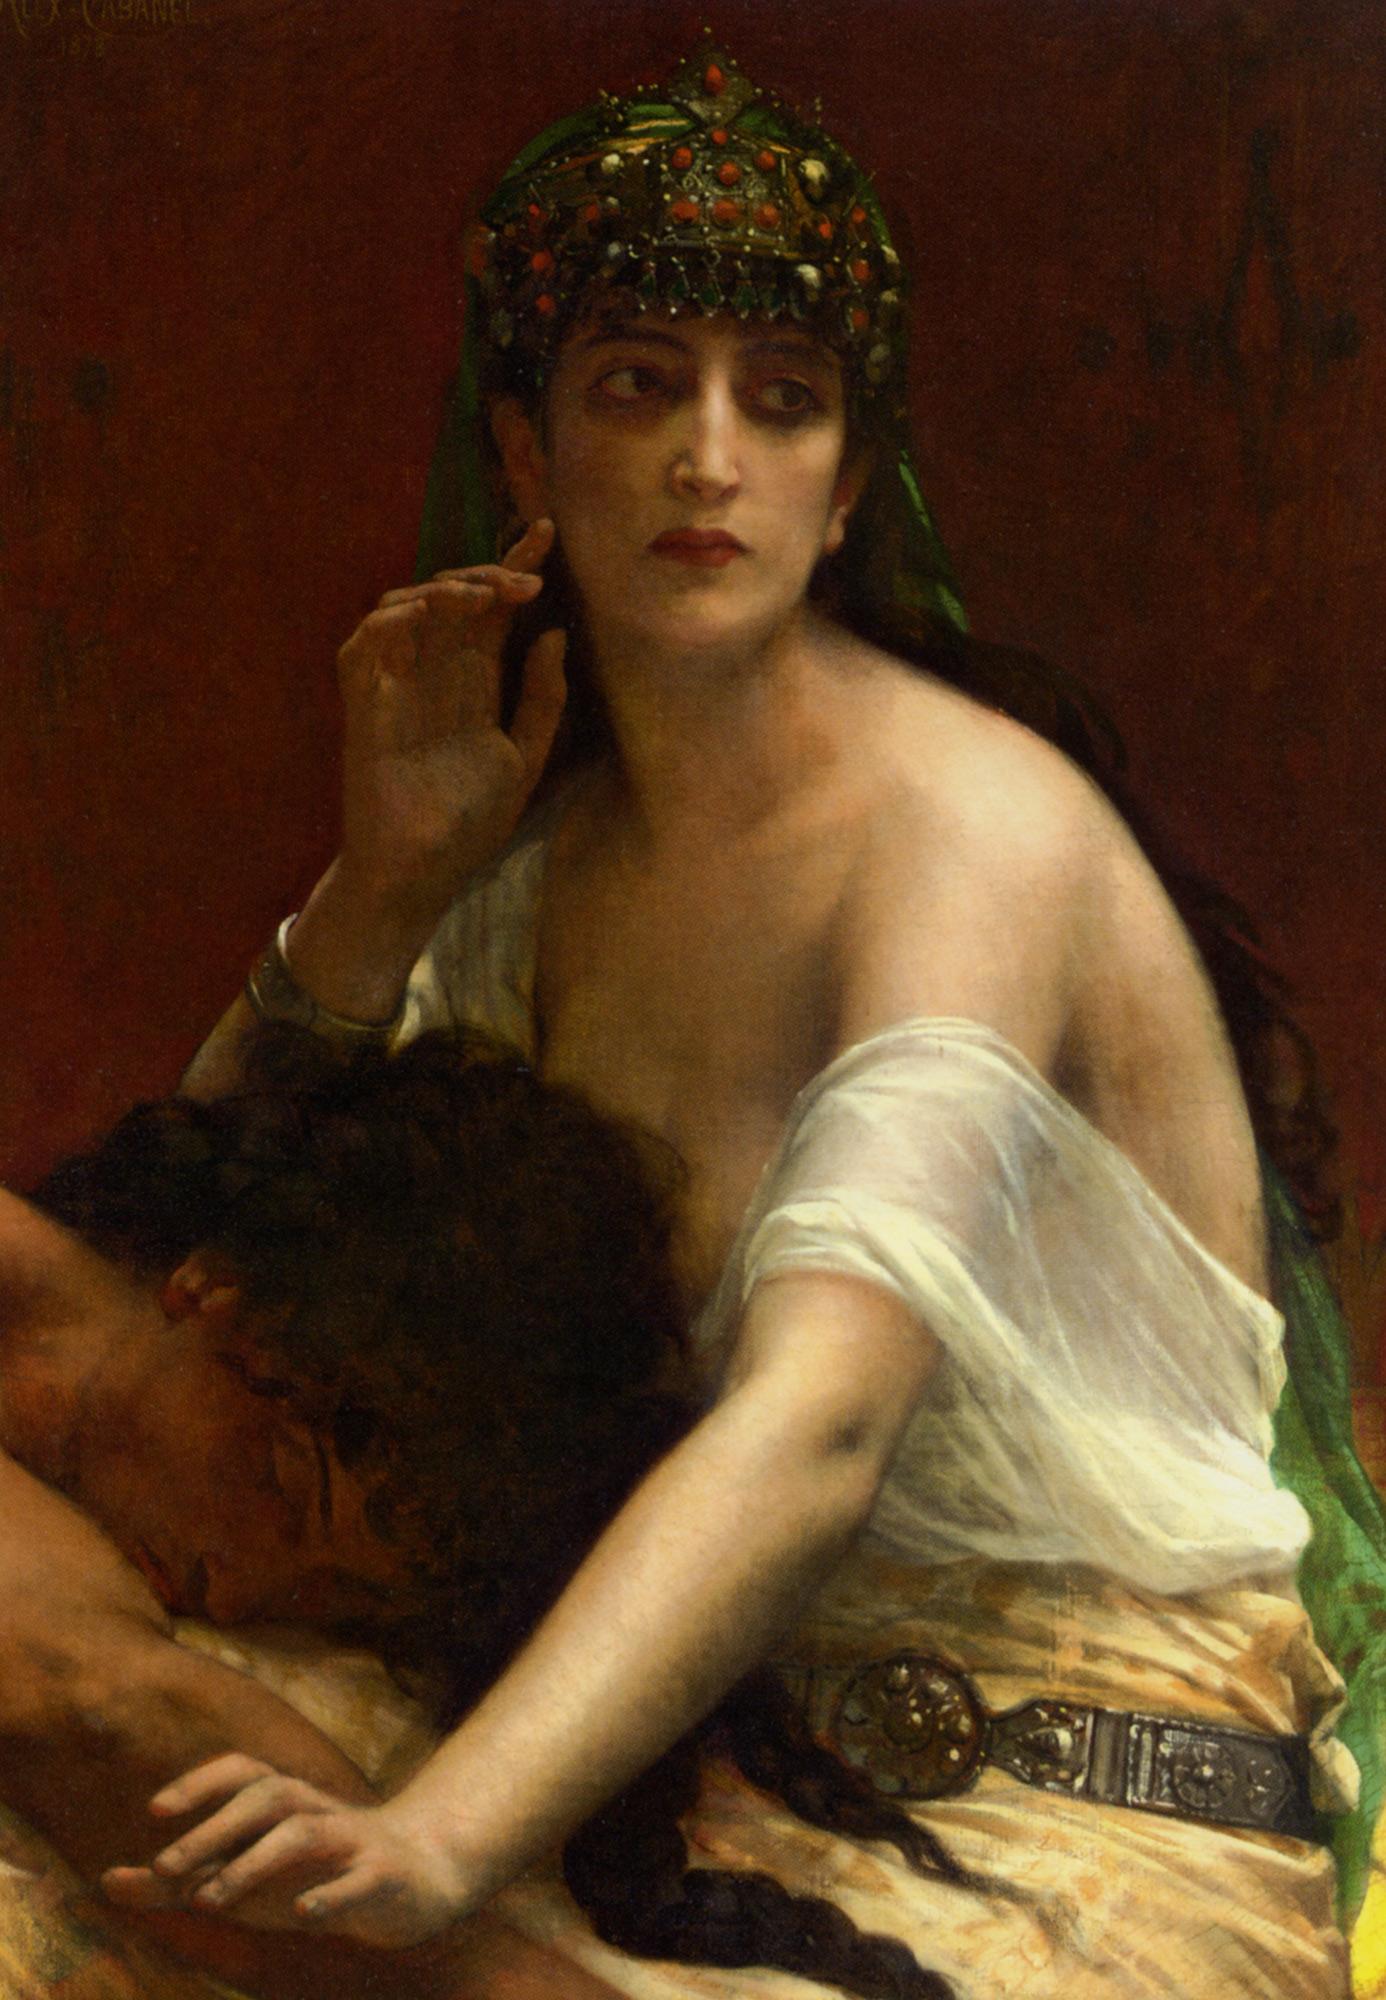 Jezebel non sexual touching